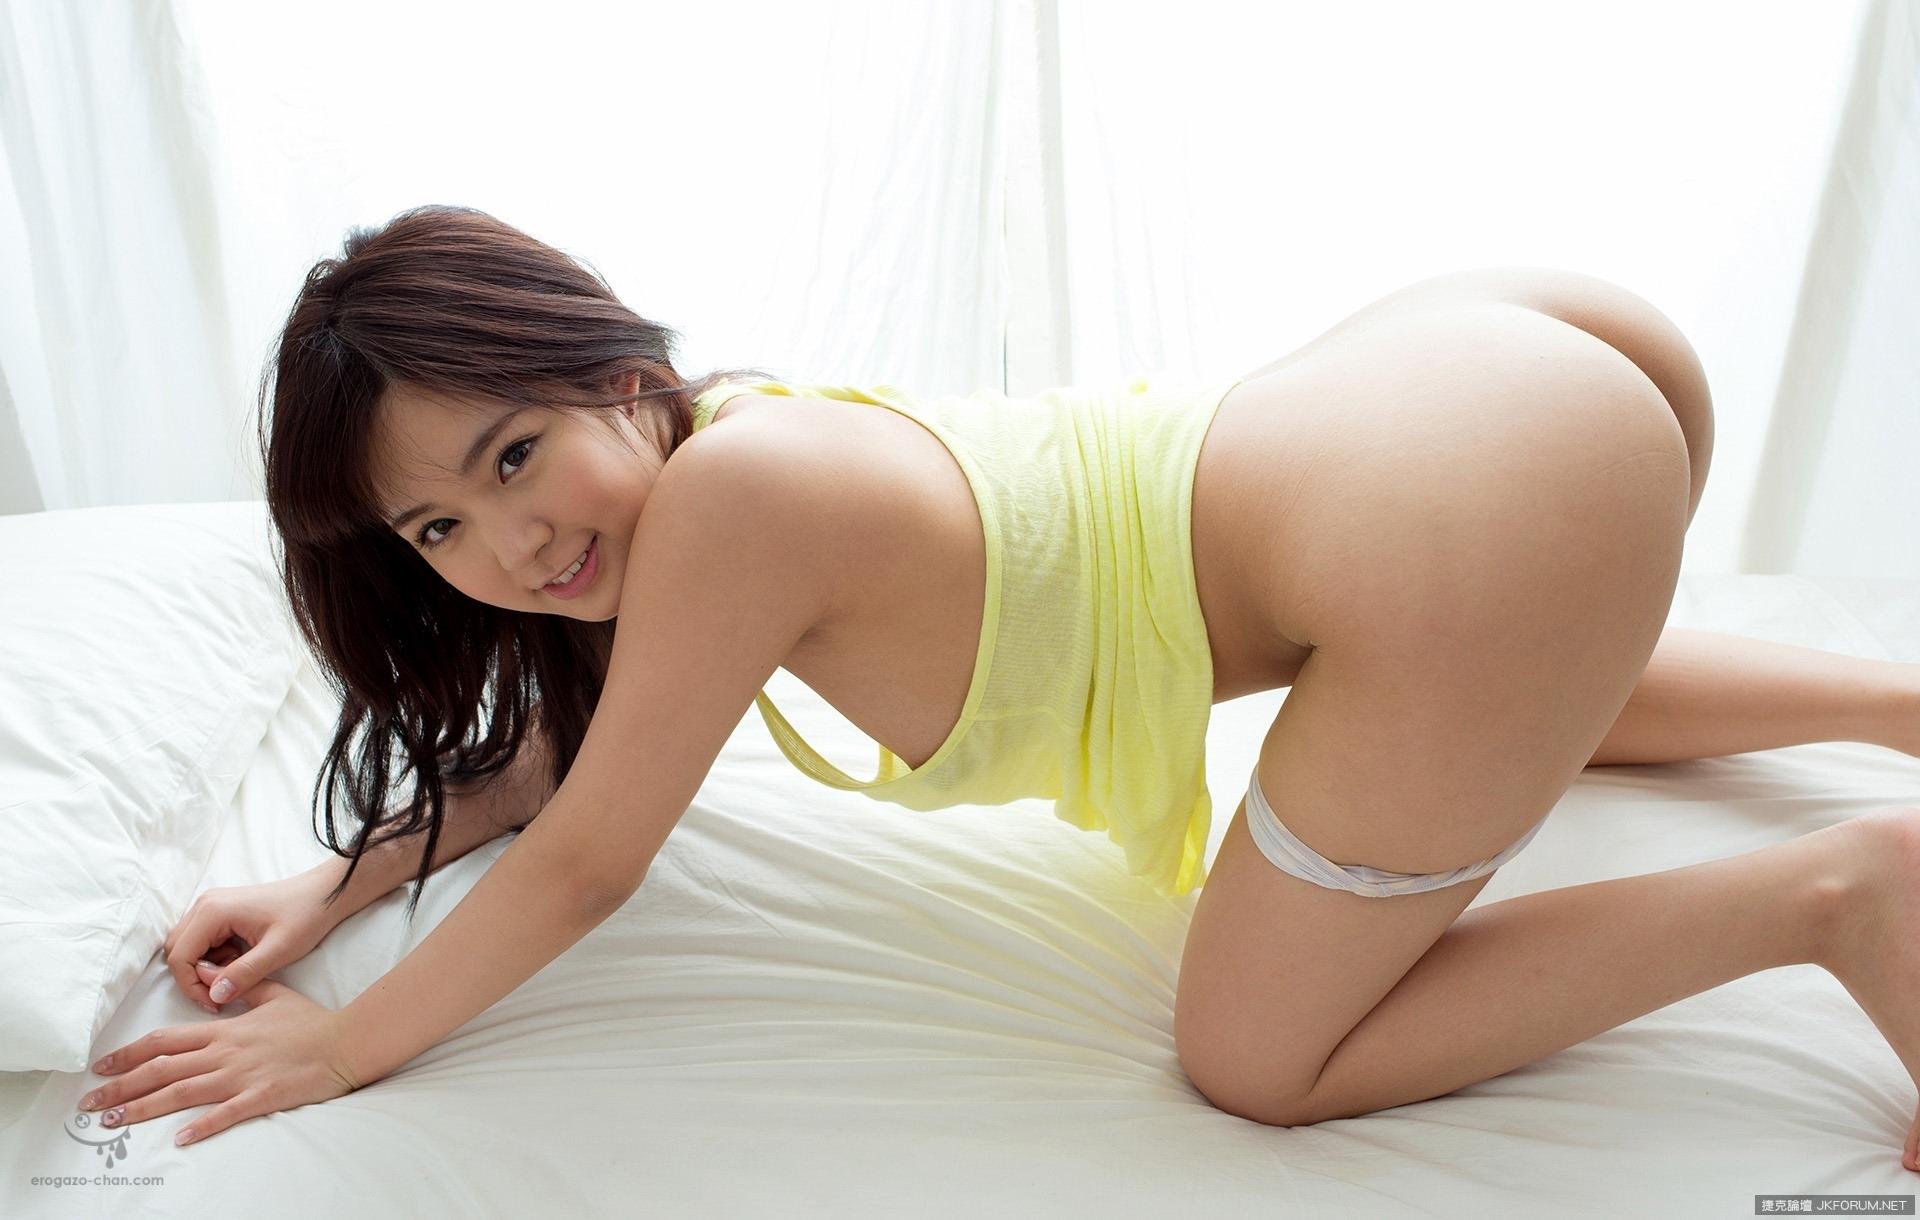 ayano_nana_1050-009.jpg